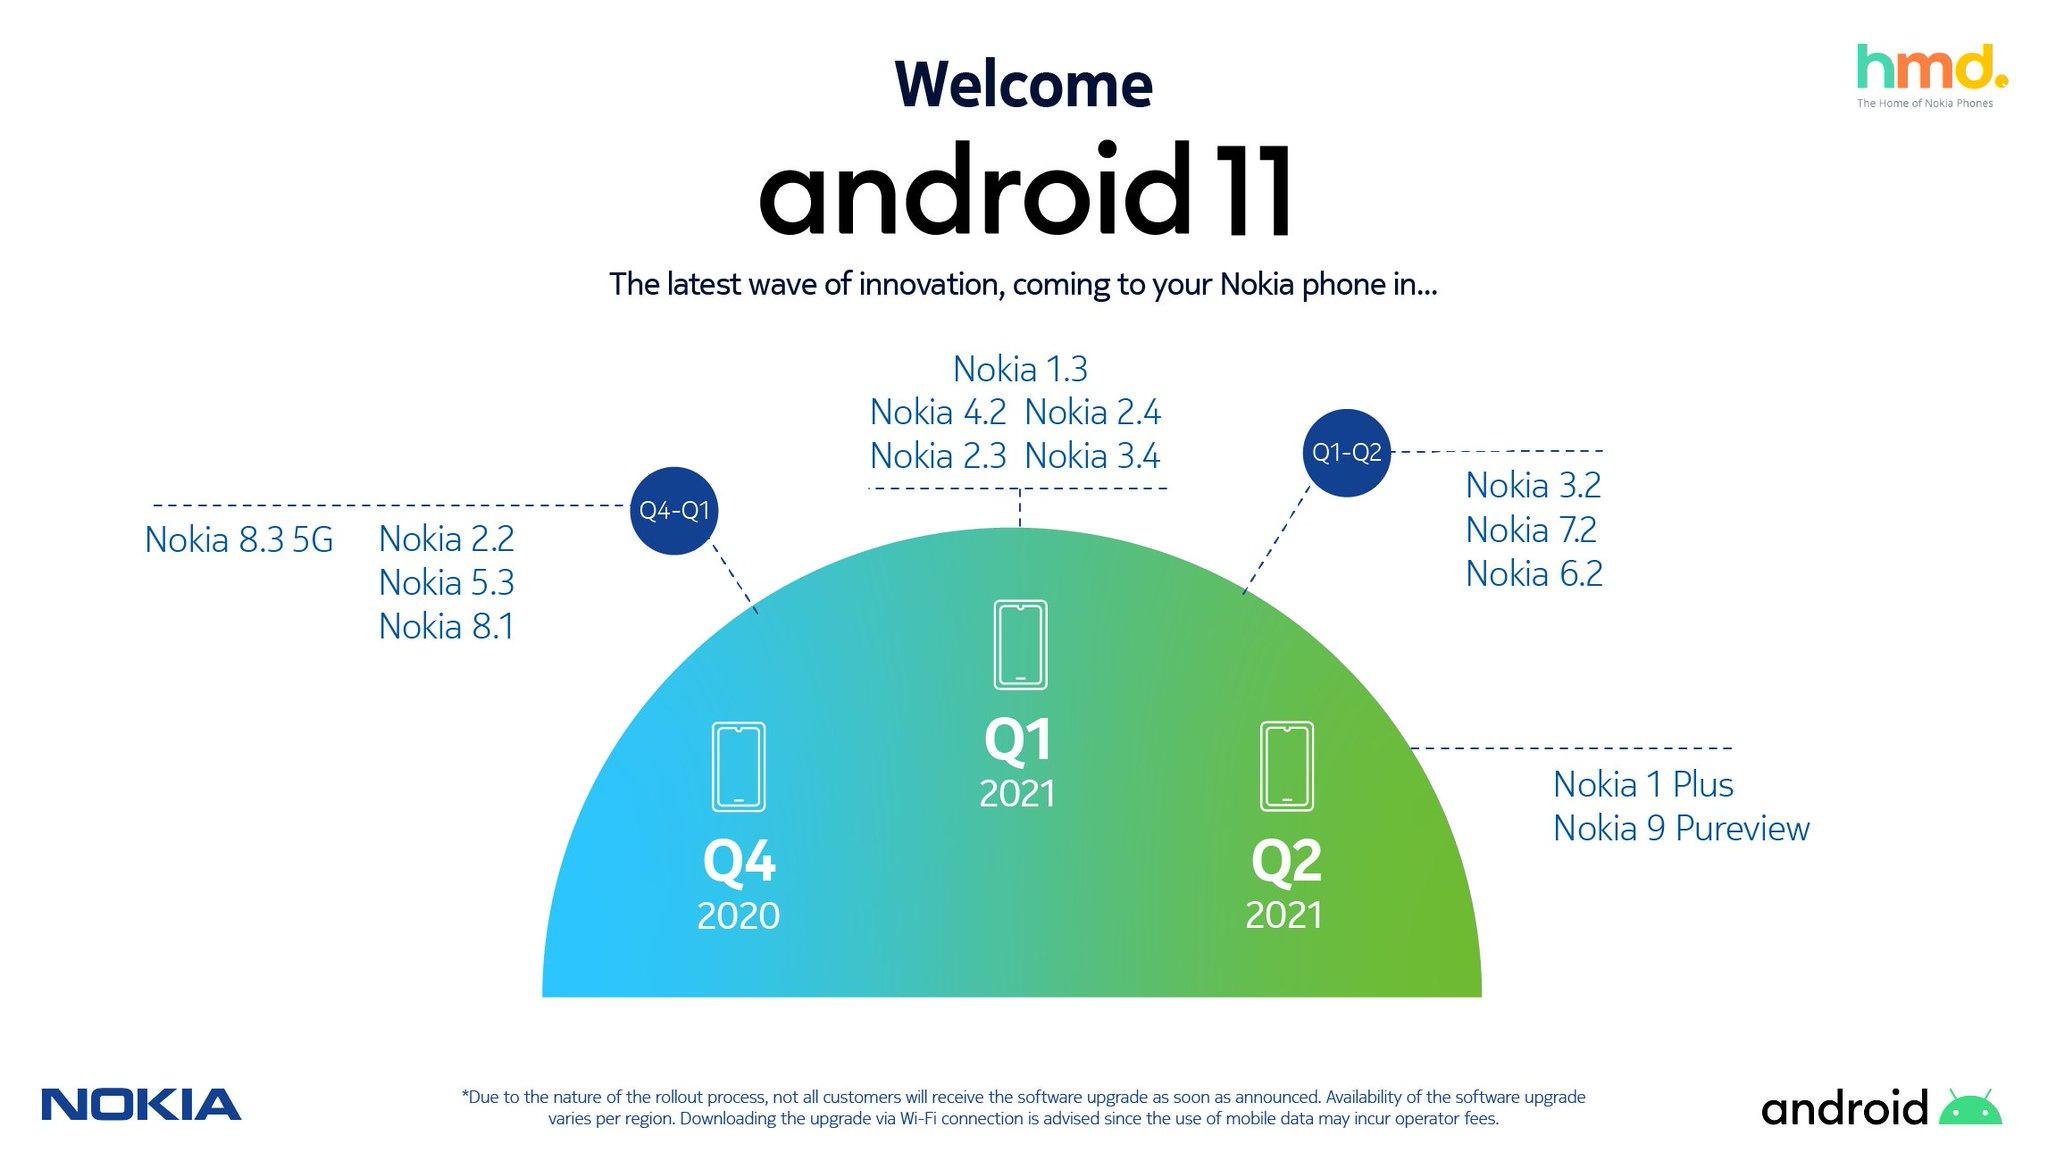 nokia Android 11 roadmap real.jpeg